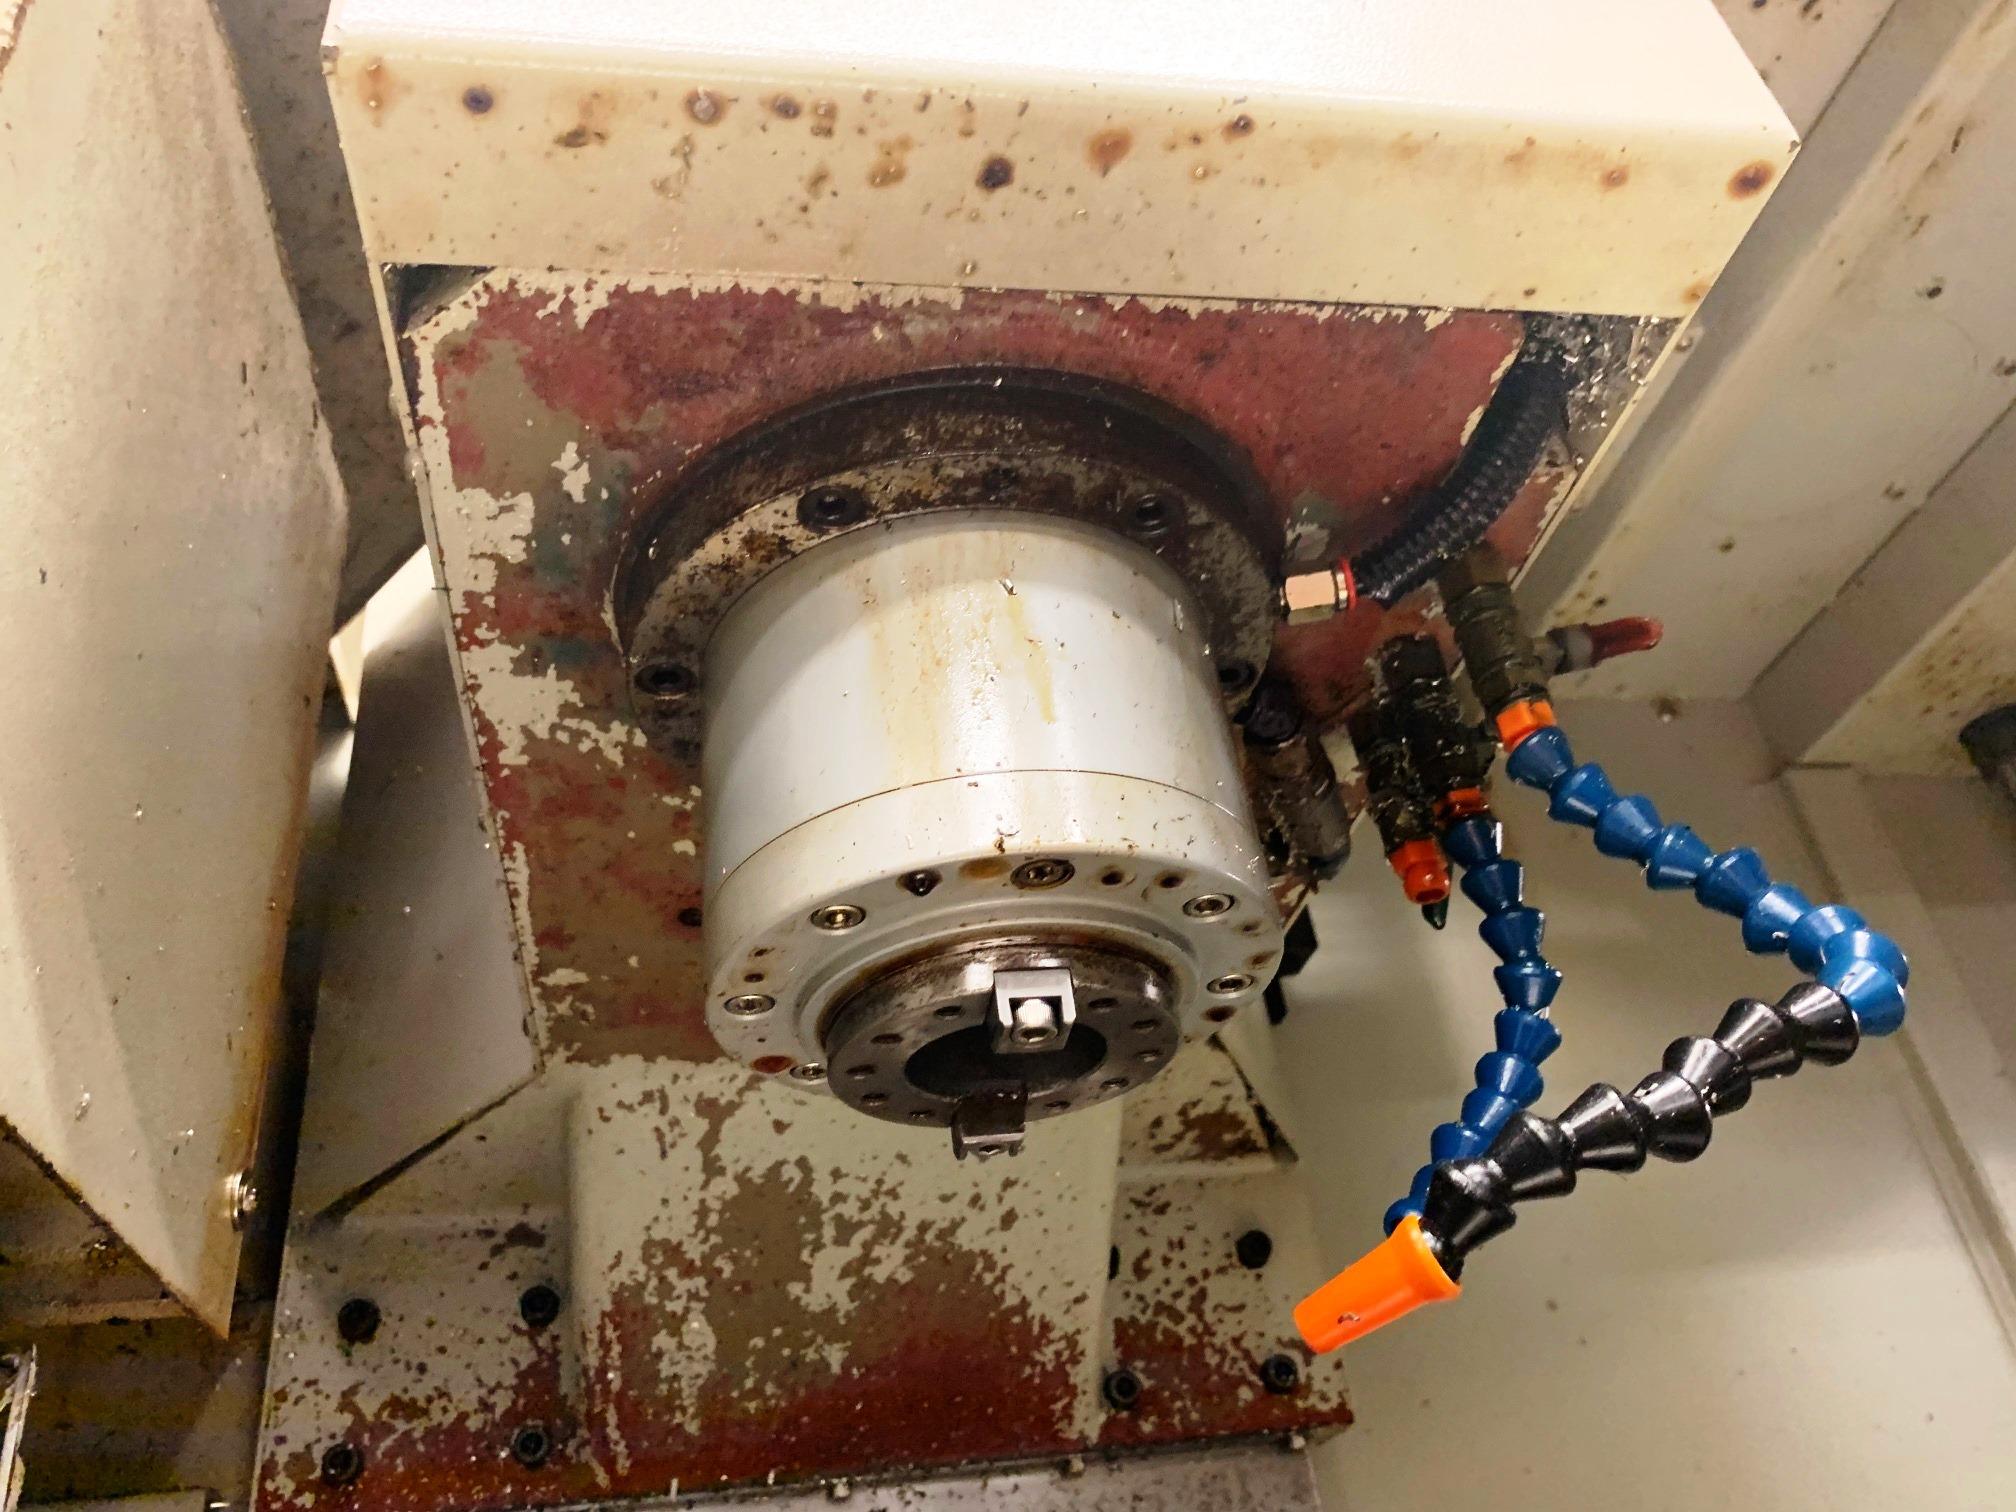 HARDINGE BRIDGEPORT XV710 CNC VERTICAL MACHINING CENTER